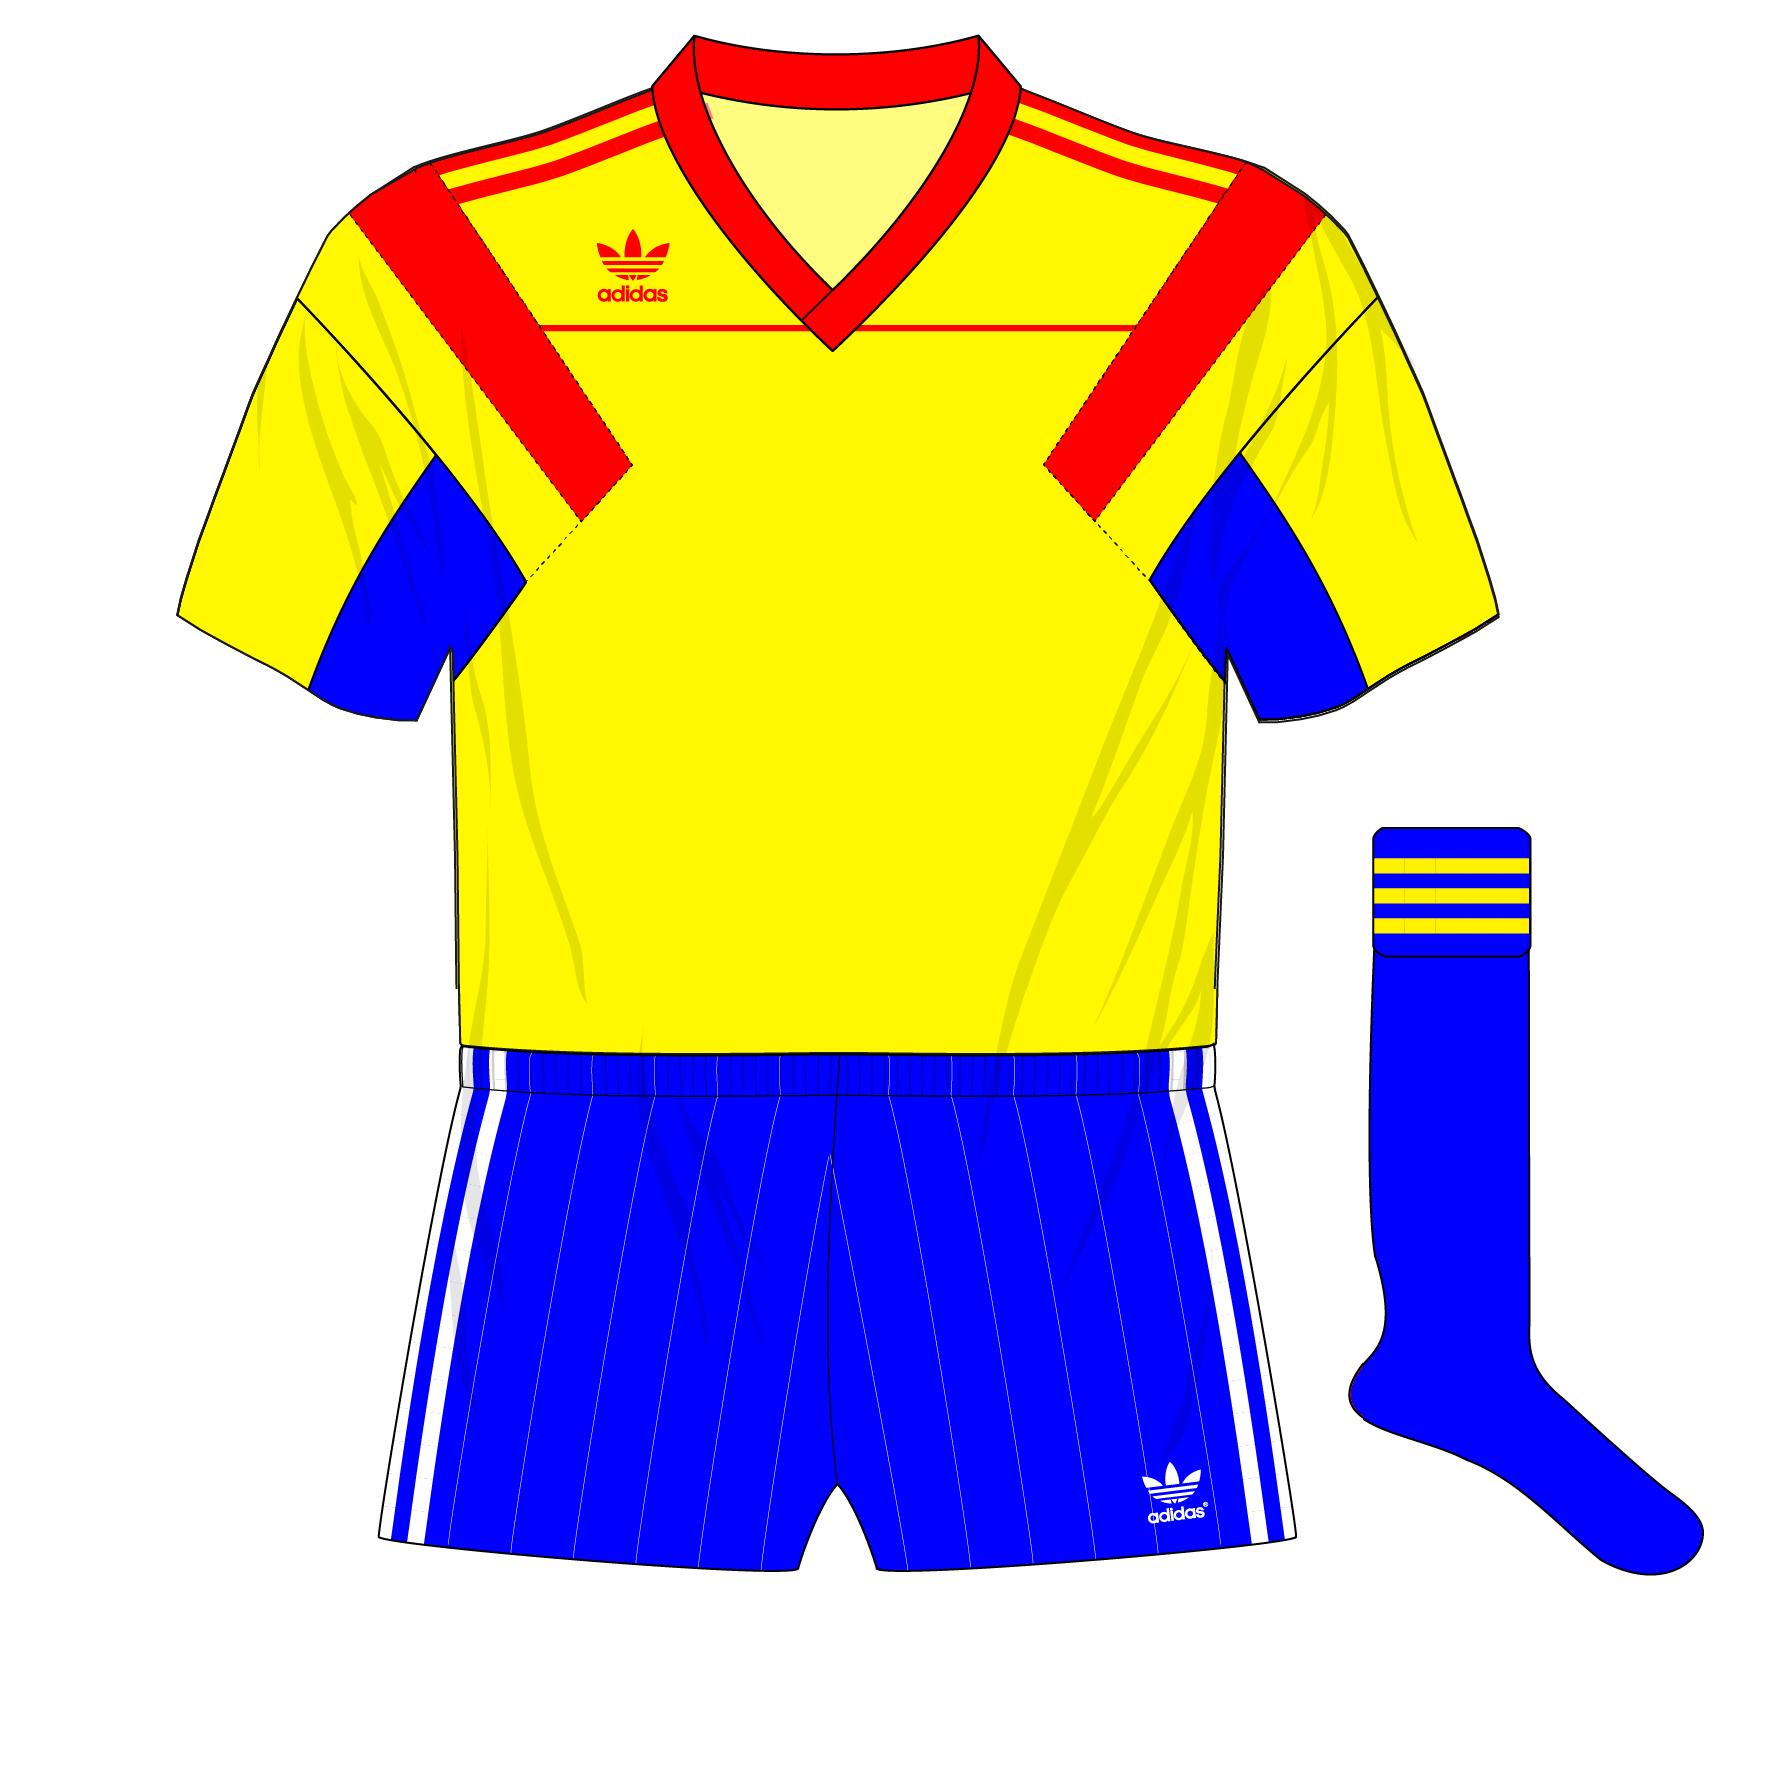 5685a9c2c Romania-adidas-1990-home-World-Cup-Belgium-friendly-blue-socks-01 .